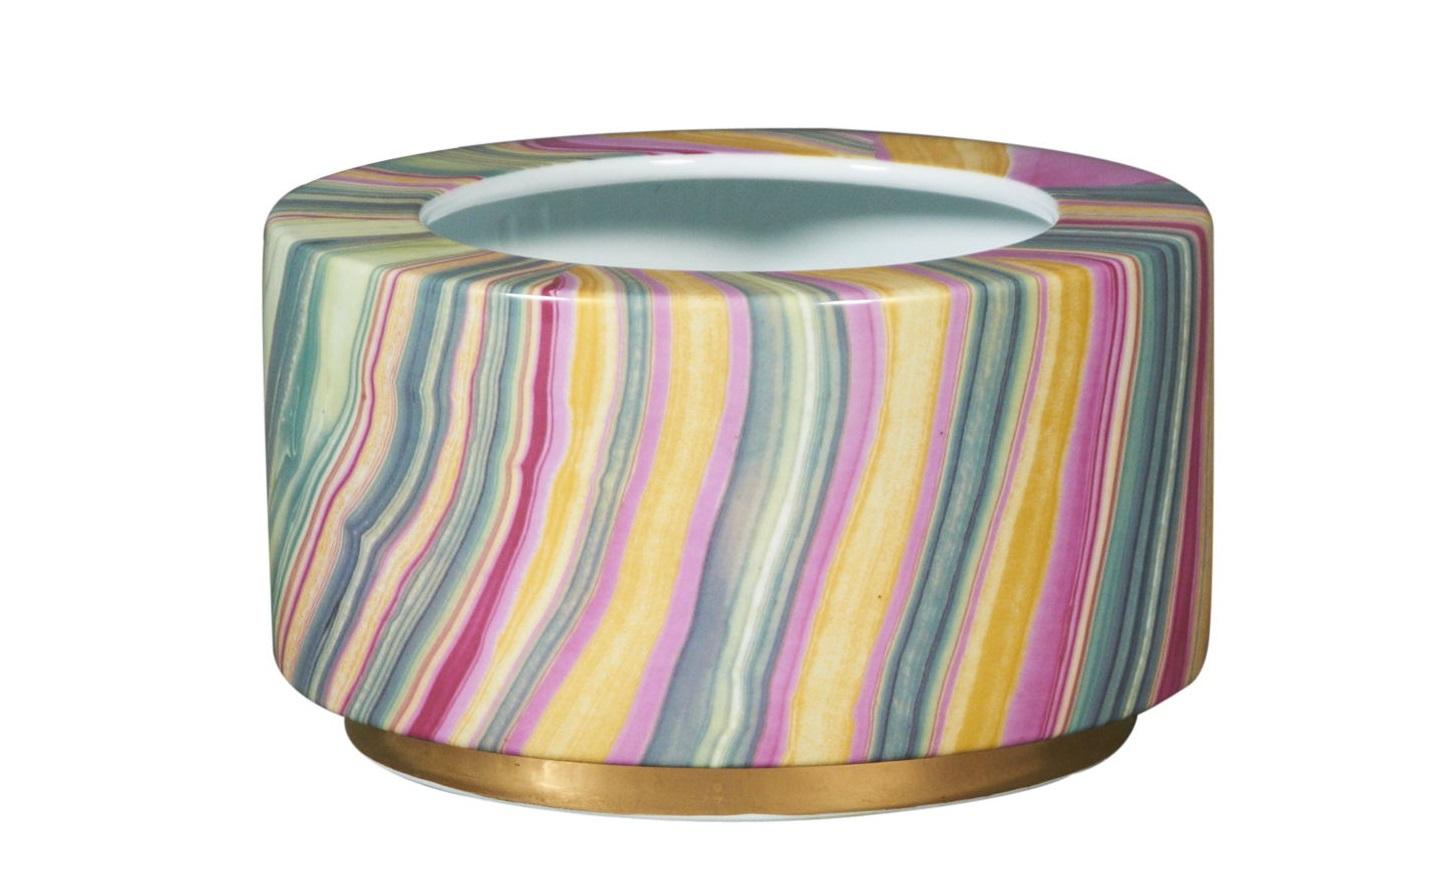 Ваза настольная RainbowДекоративные чаши<br><br><br>Material: Керамика<br>Width см: 24<br>Depth см: 24<br>Height см: 16